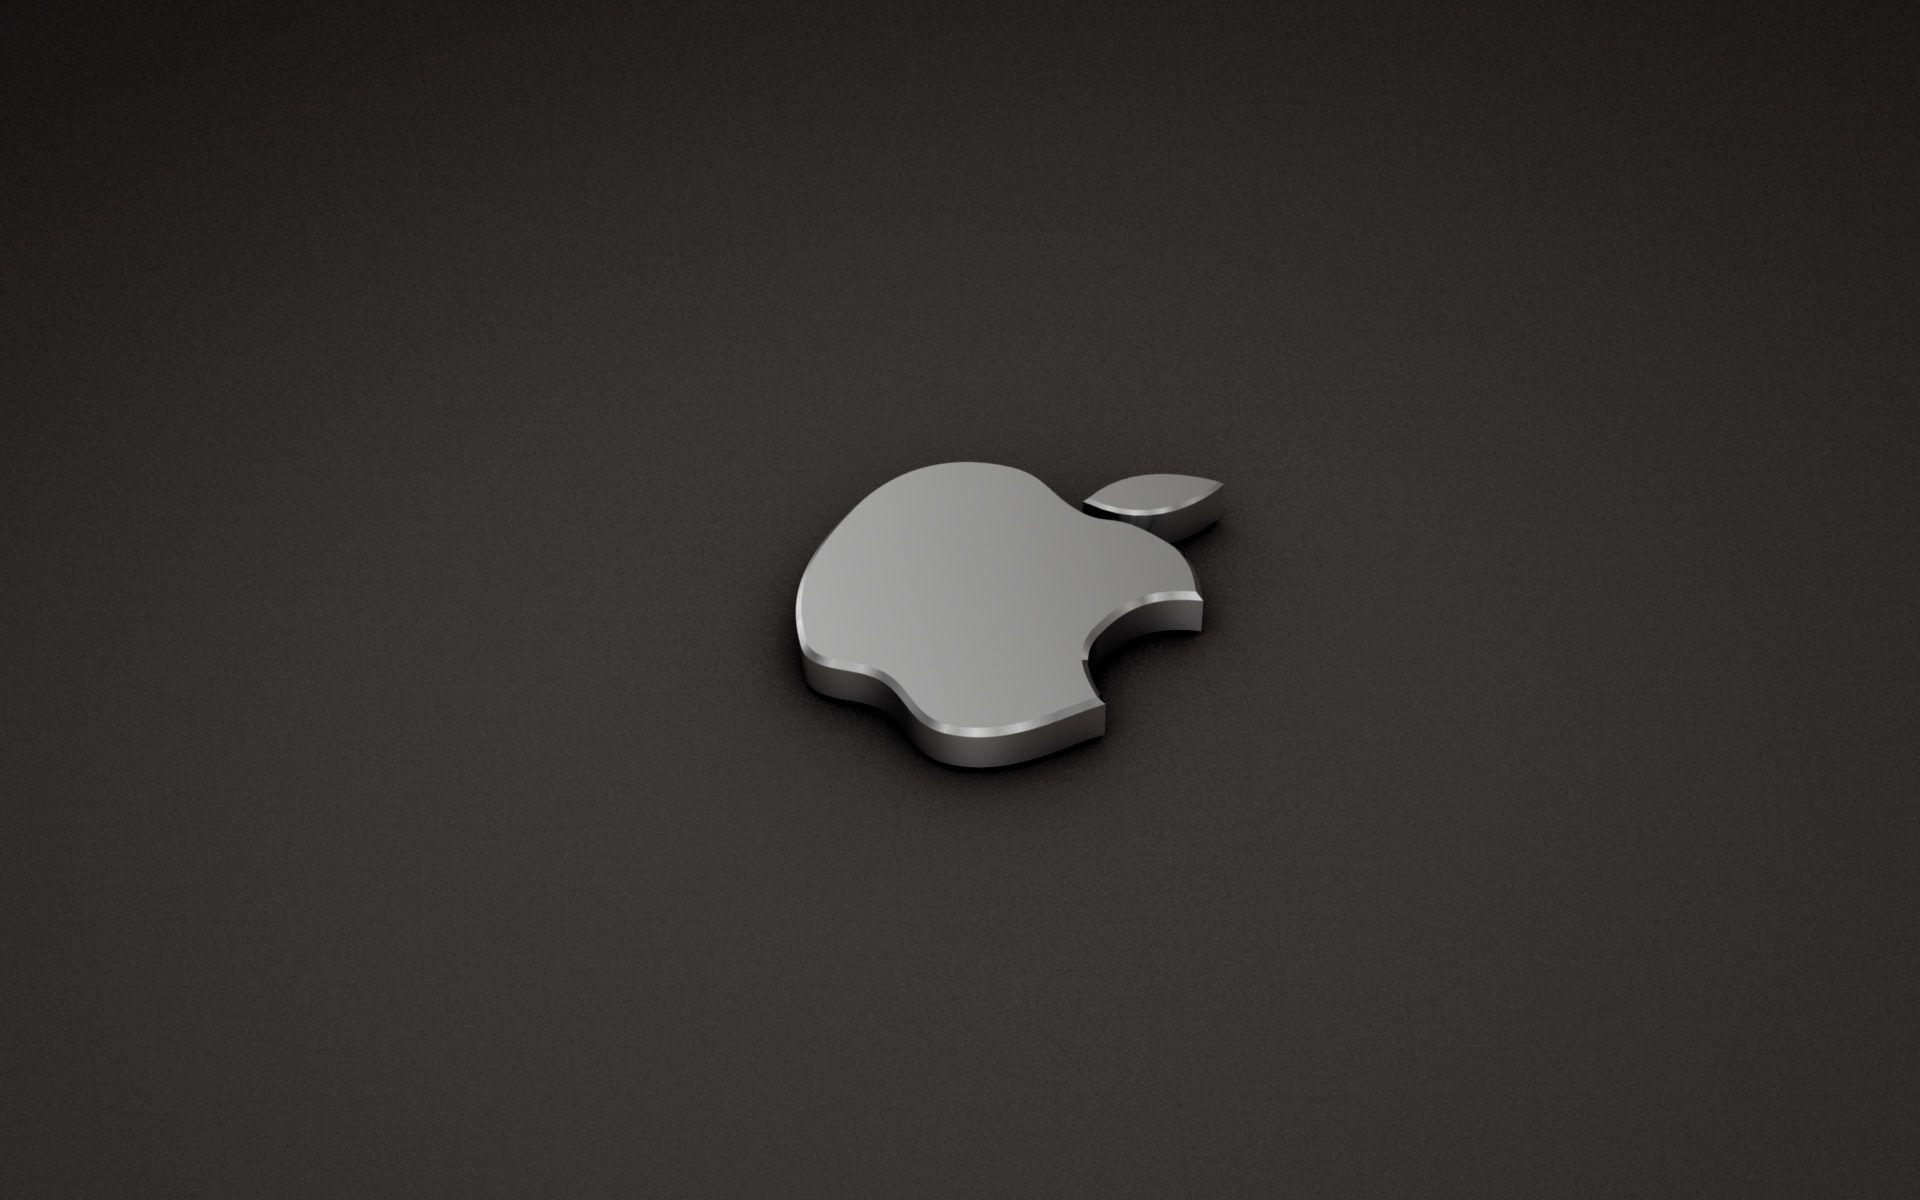 Apple Logo Wallpapers - Full Hd Iphone Logo , HD Wallpaper & Backgrounds